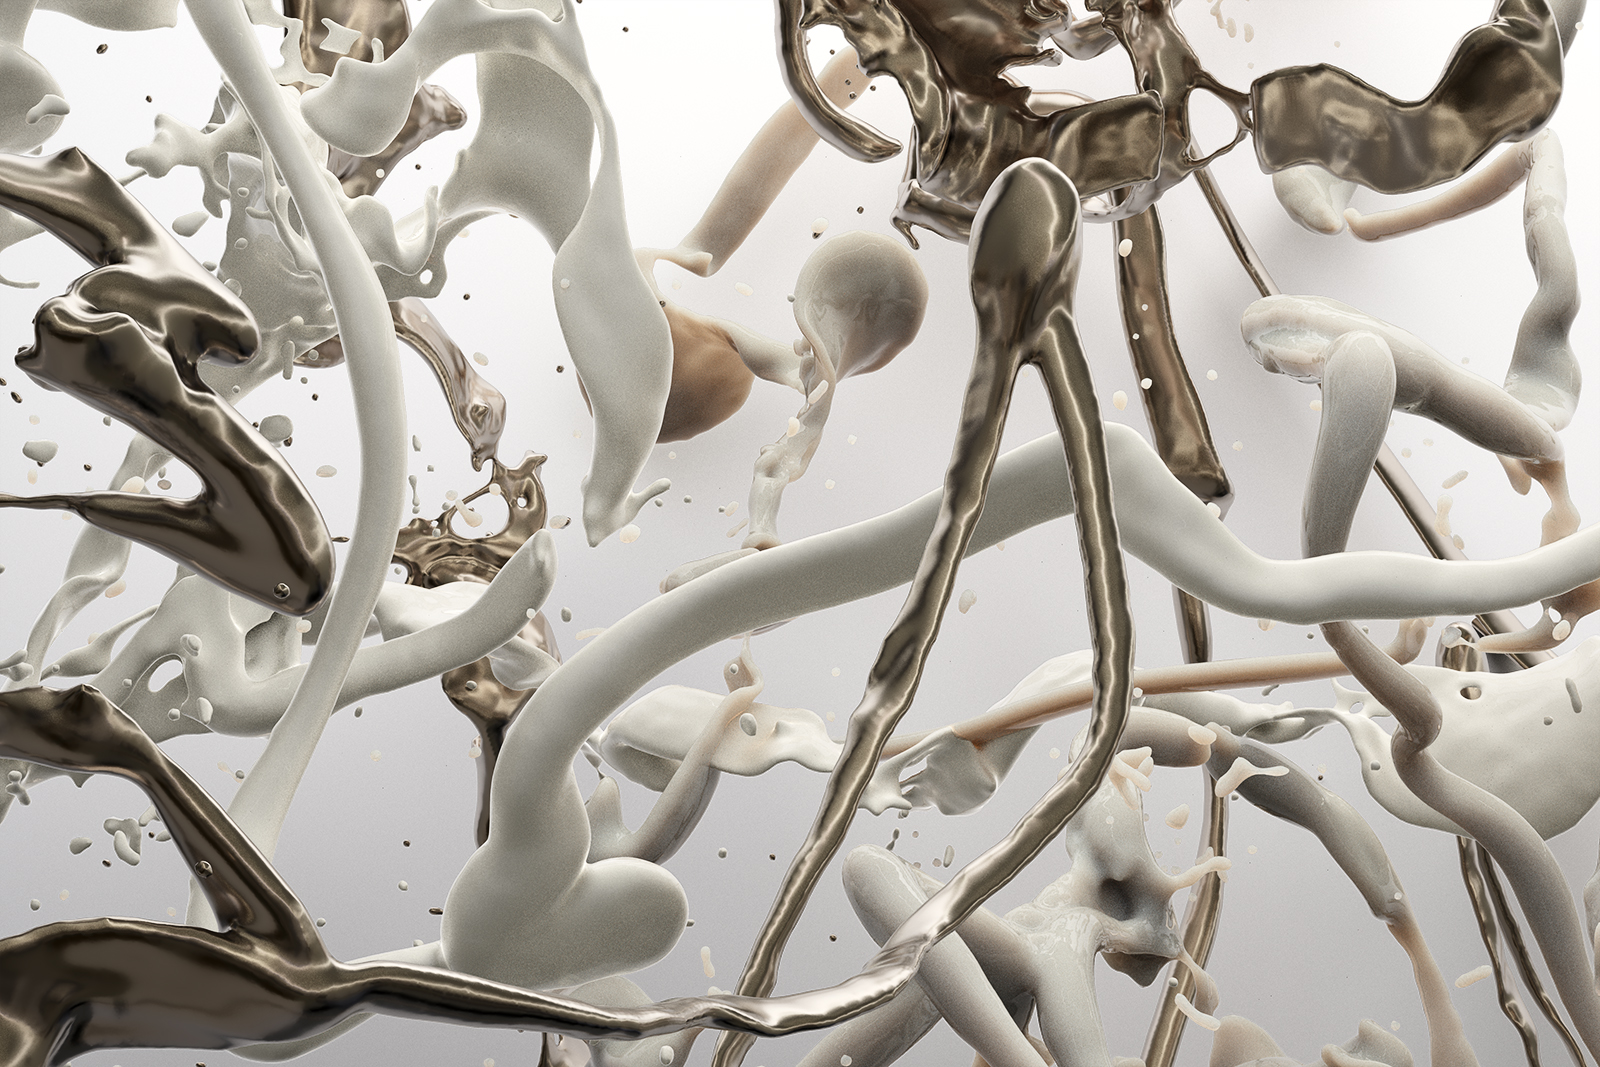 Bodypaint V 24, CGI Fine Art Print, 70 x 105 cm, 2020